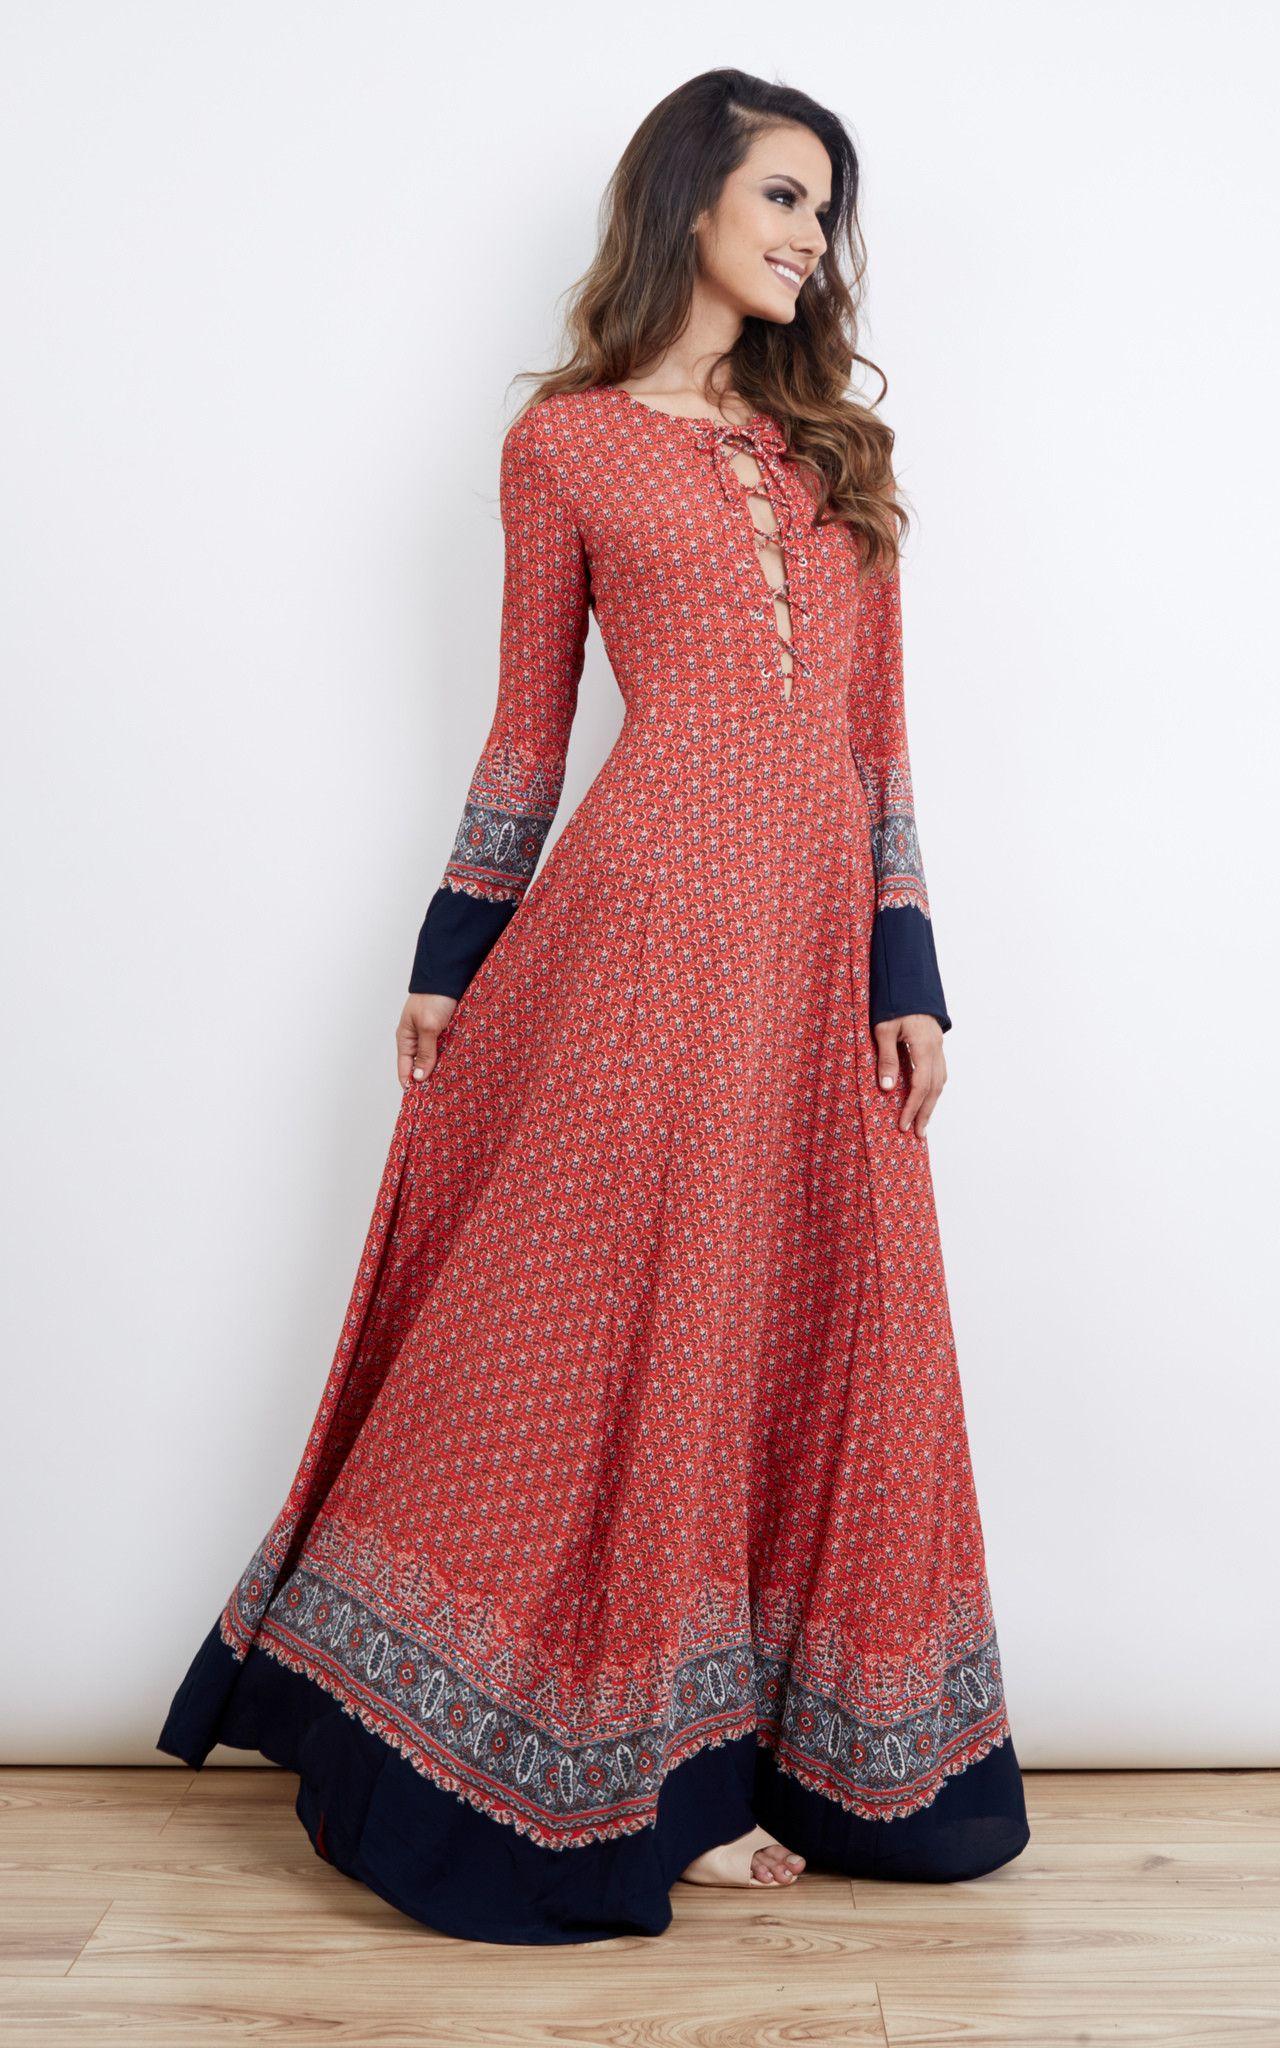 Red navy border long sleeve up maxi dress new look pinterest